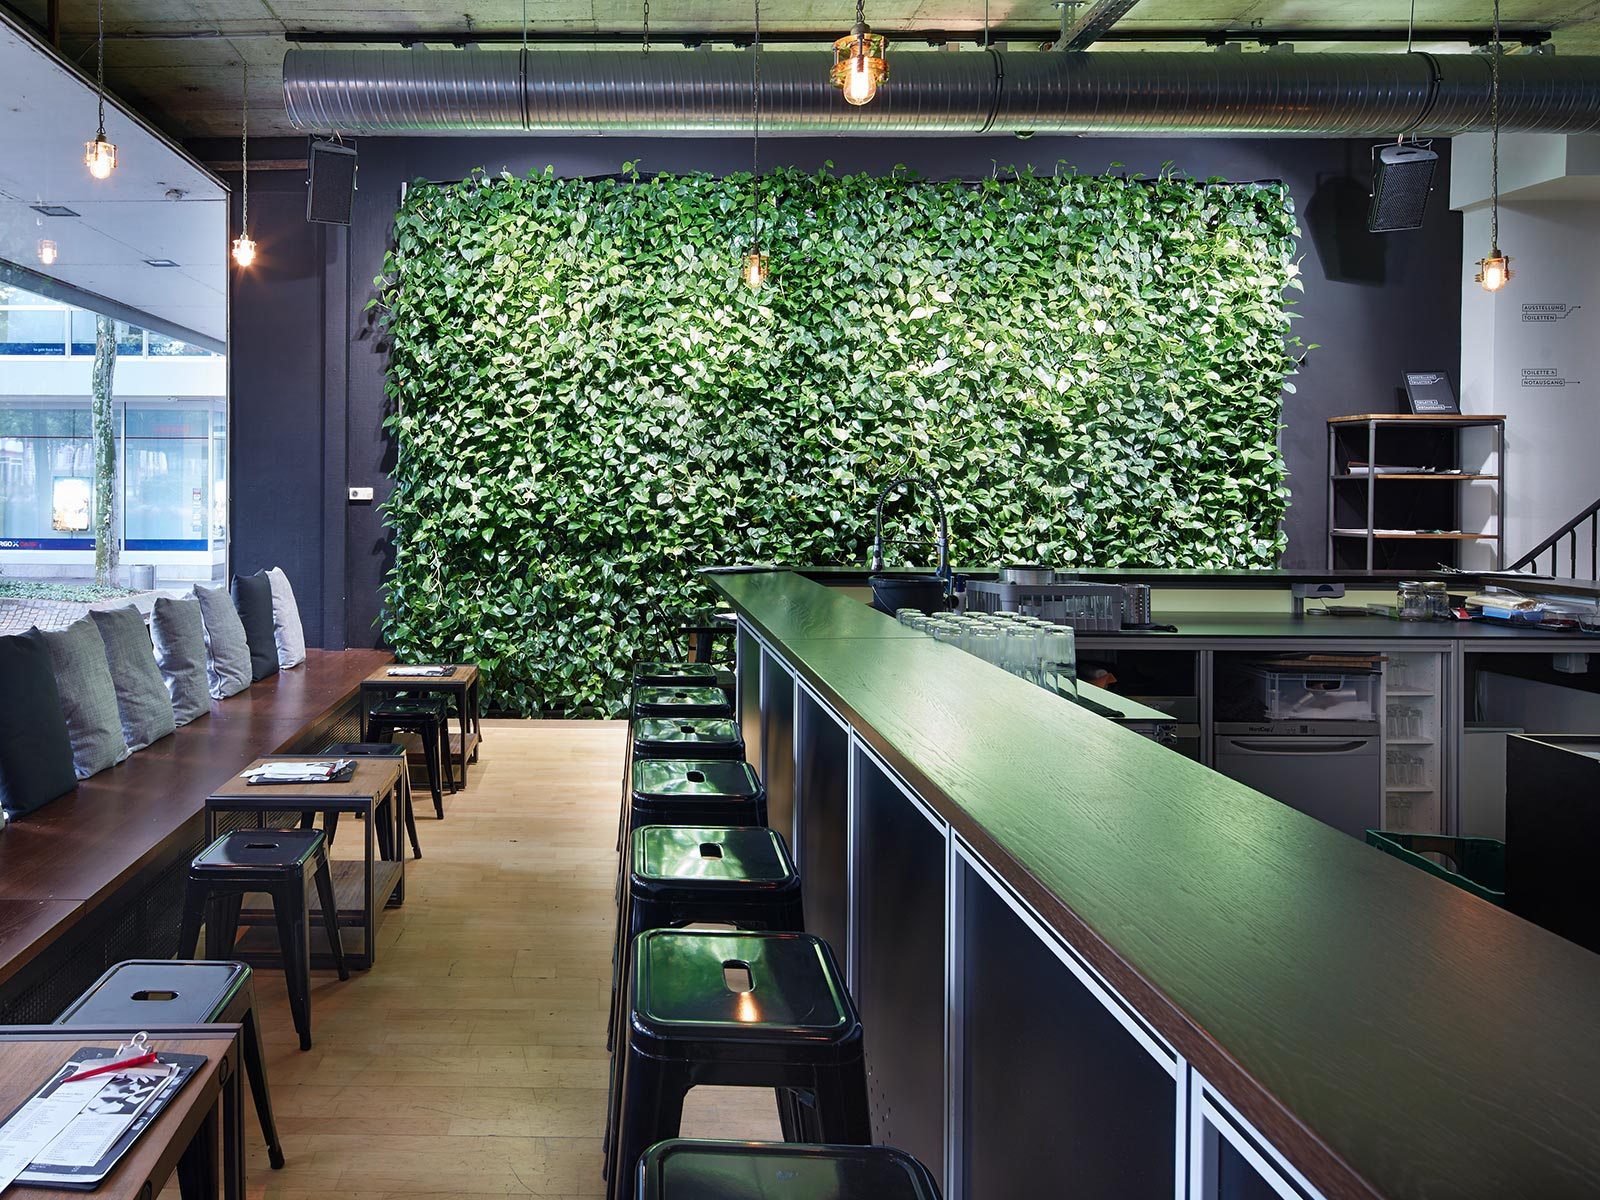 Wandbegrünung Innen Selber Machen pflanzenwände hydroflora modular variabel individuell